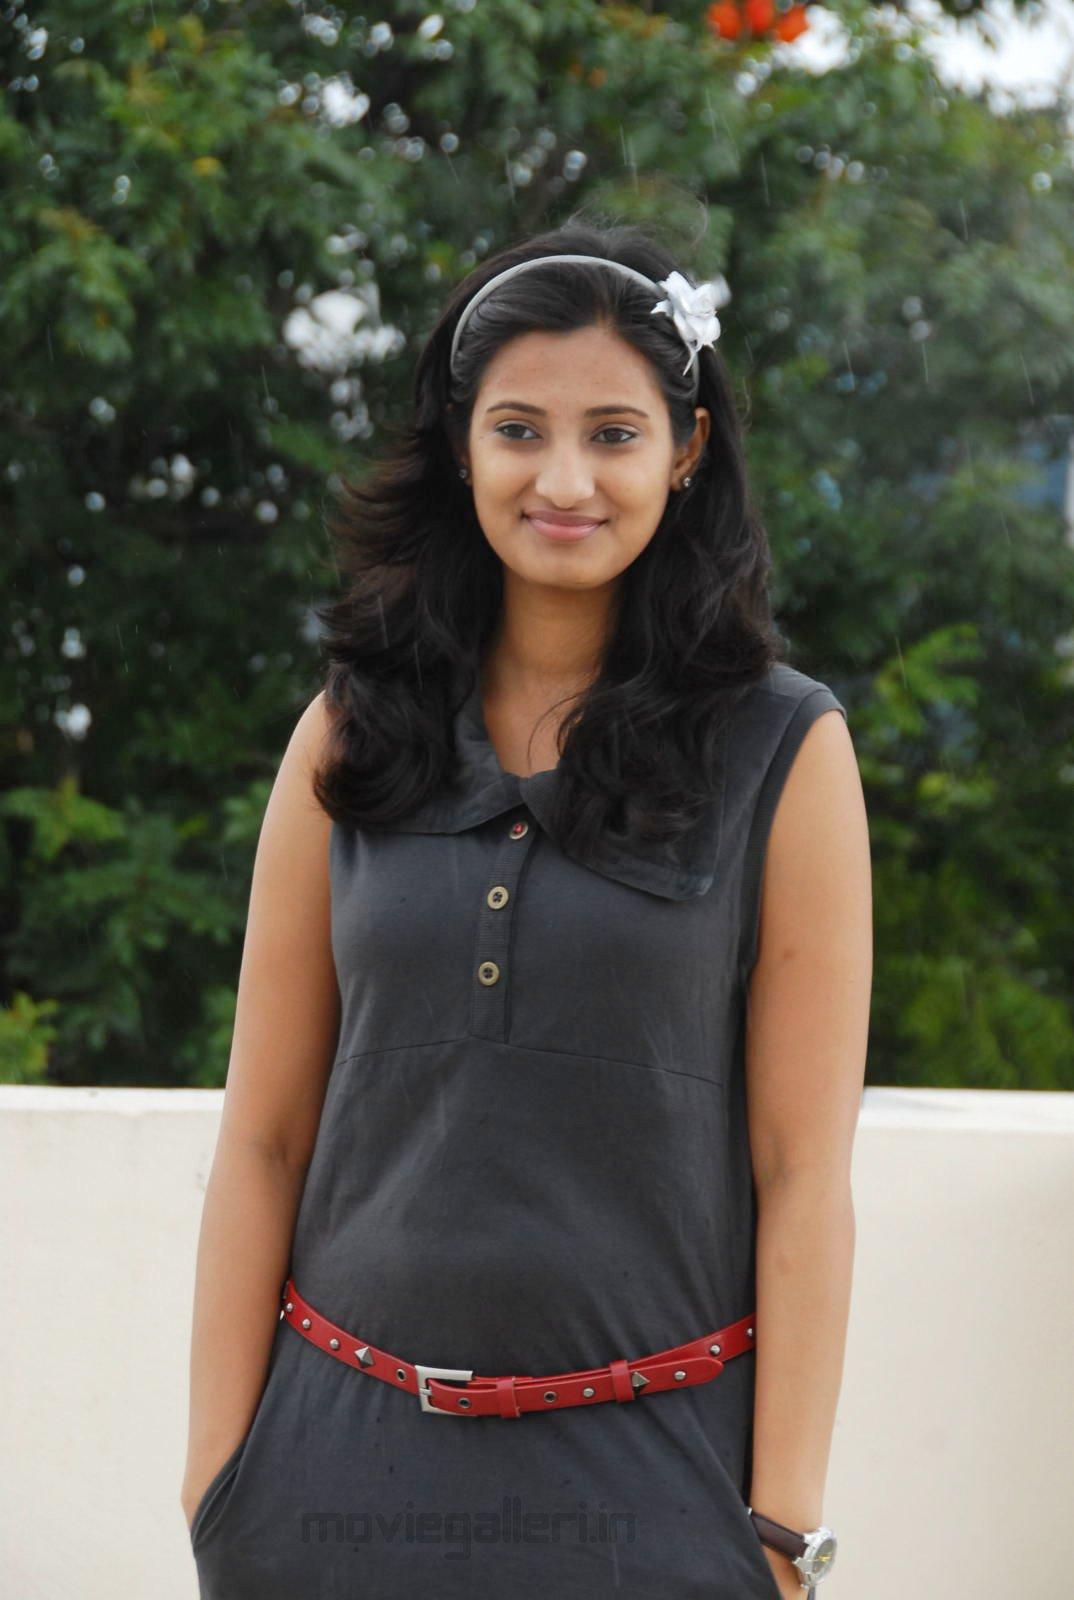 Soumya Tv Anchor Stills Telugu Tv Anchor Soumya Photo